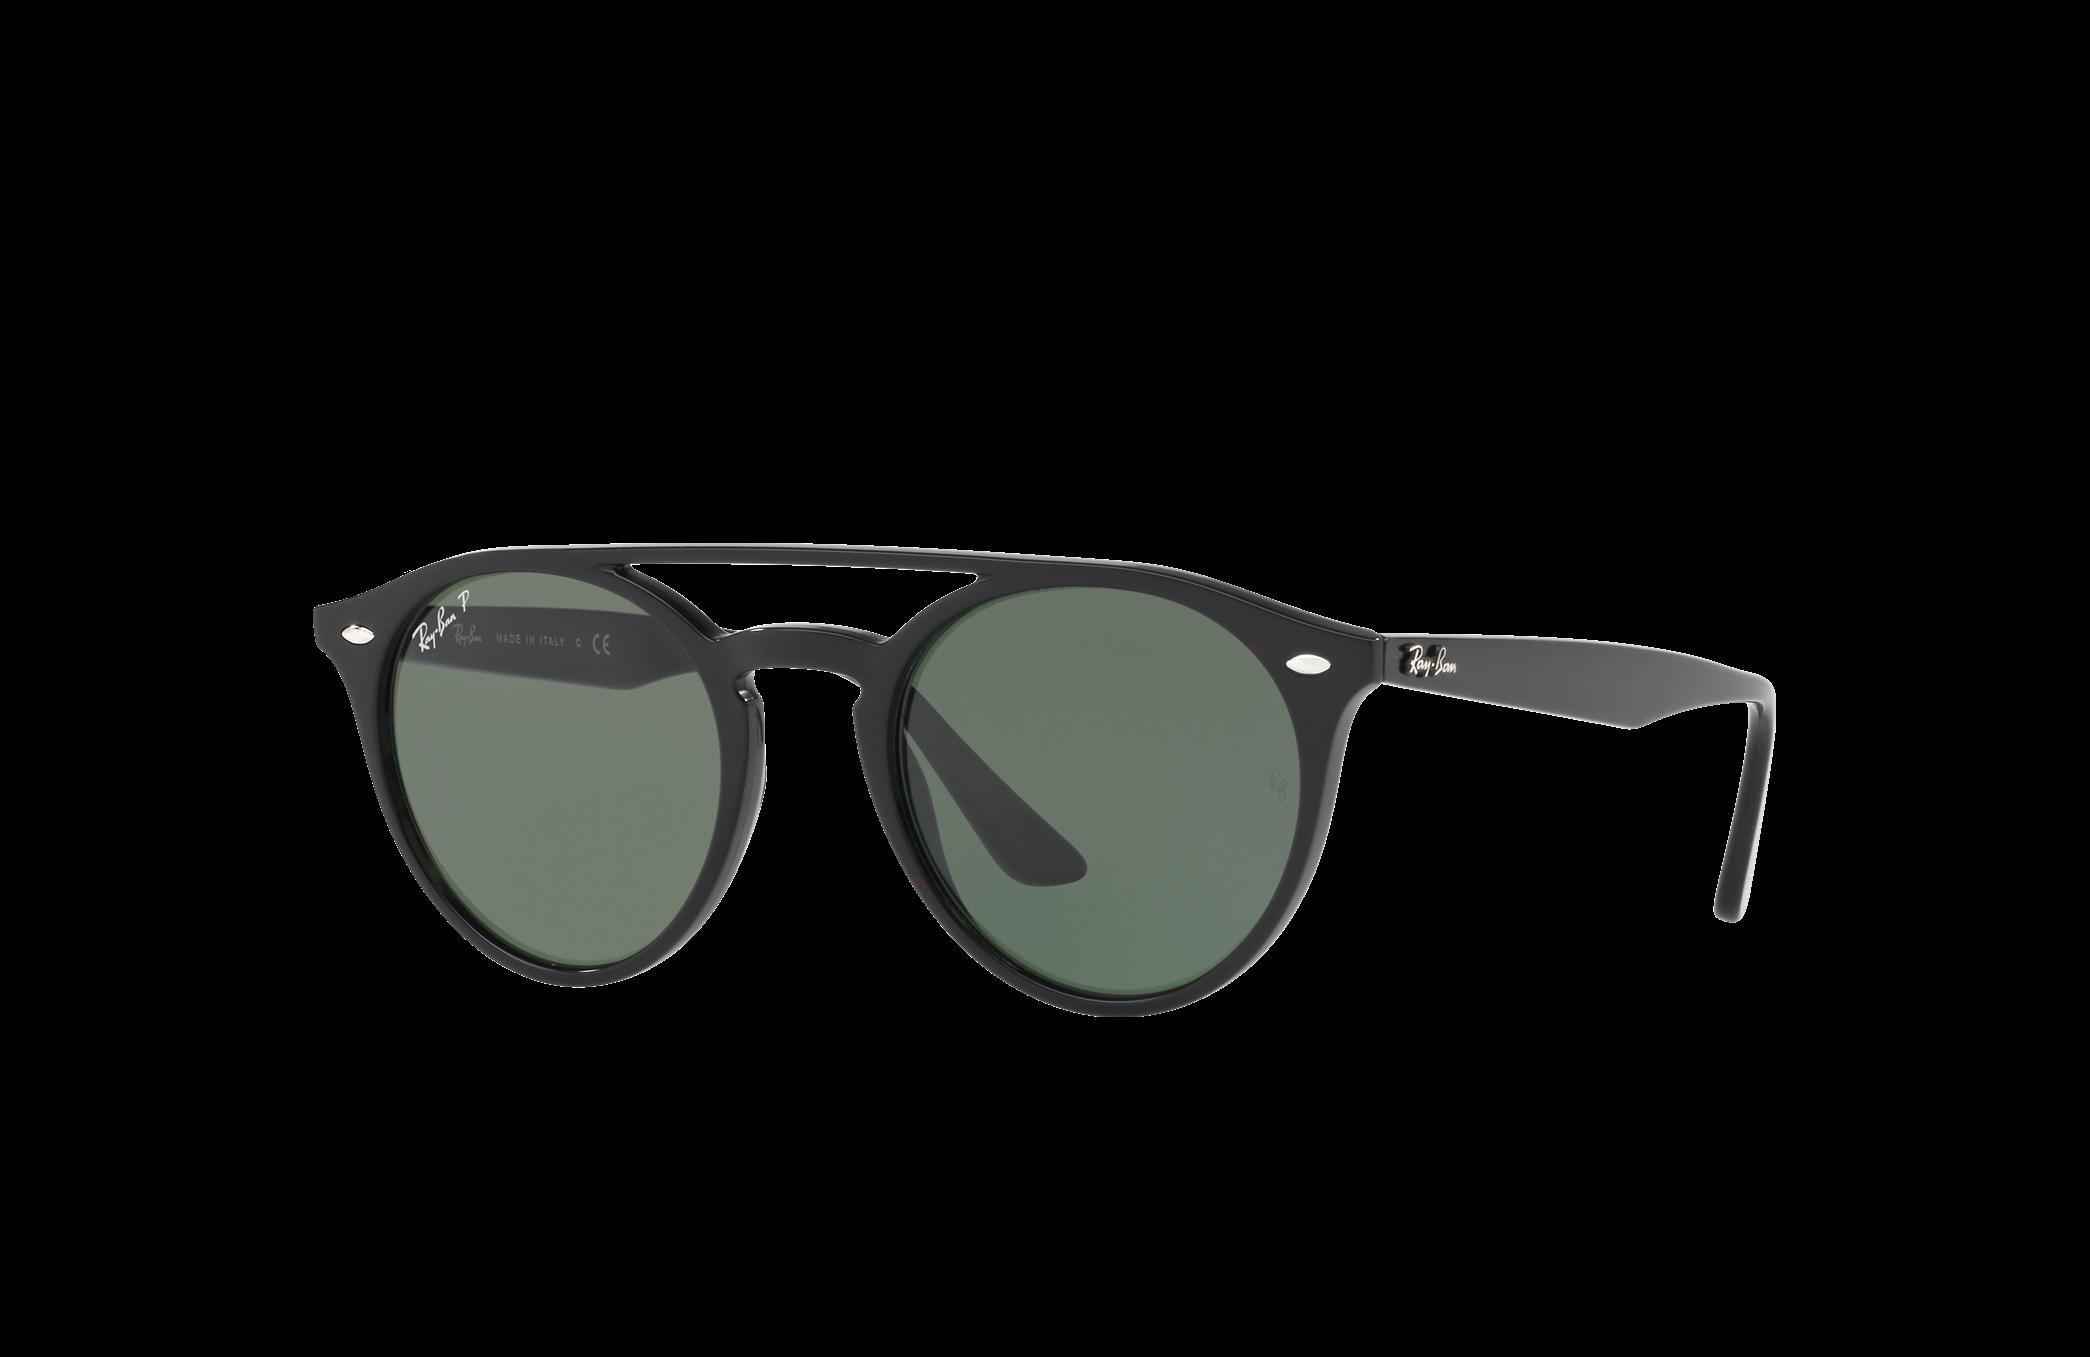 Ray-Ban Rb4279 Black, Polarized Green Lenses - RB4279